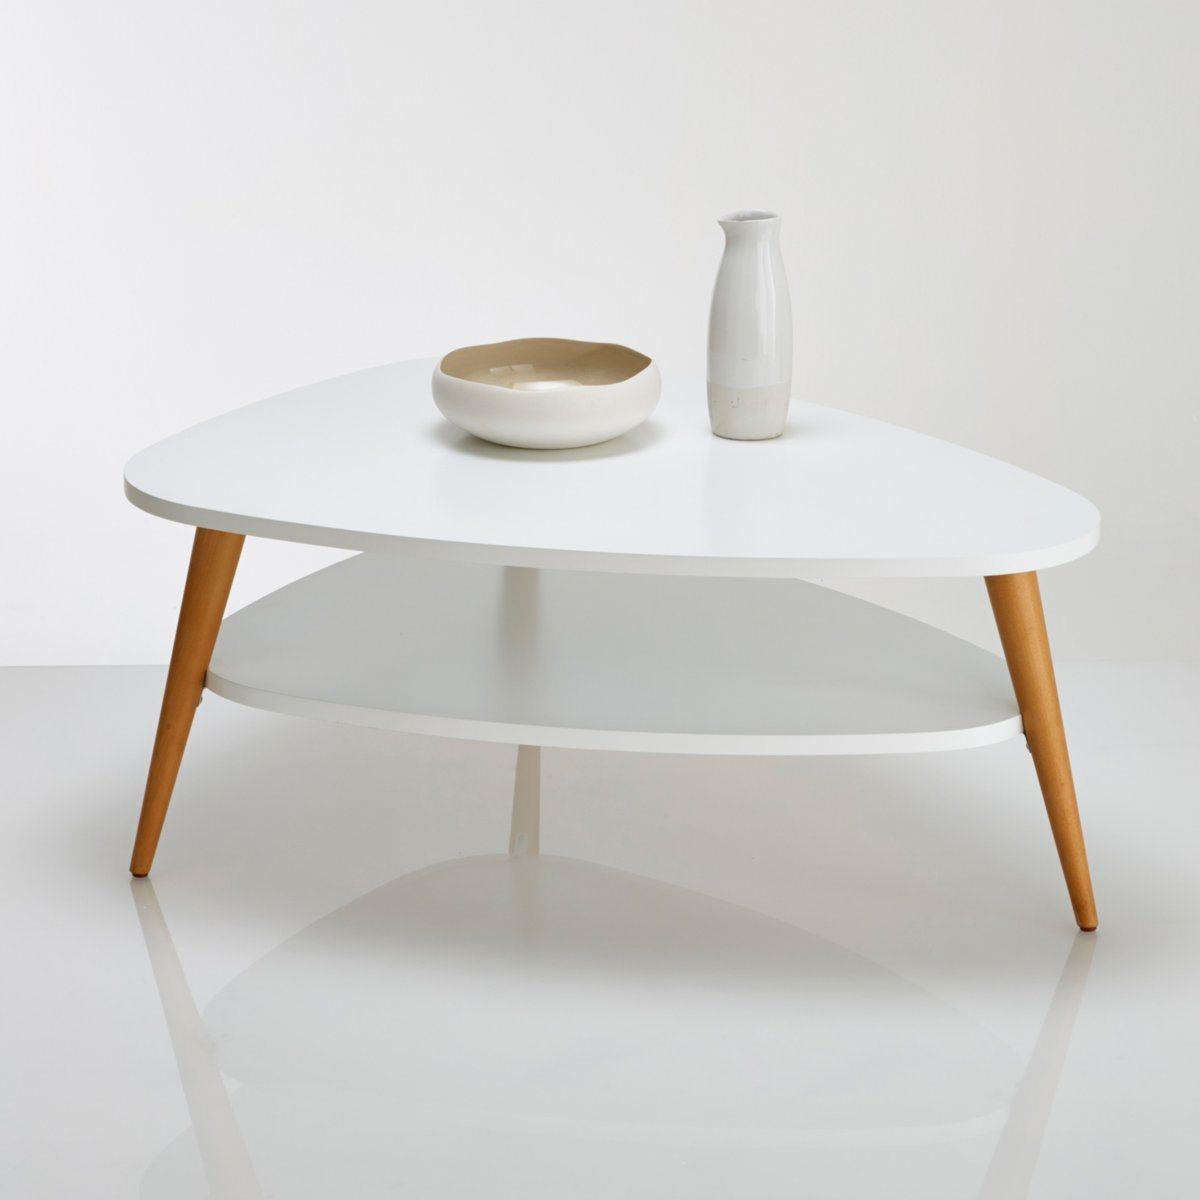 Le bon coin table basse scandinave